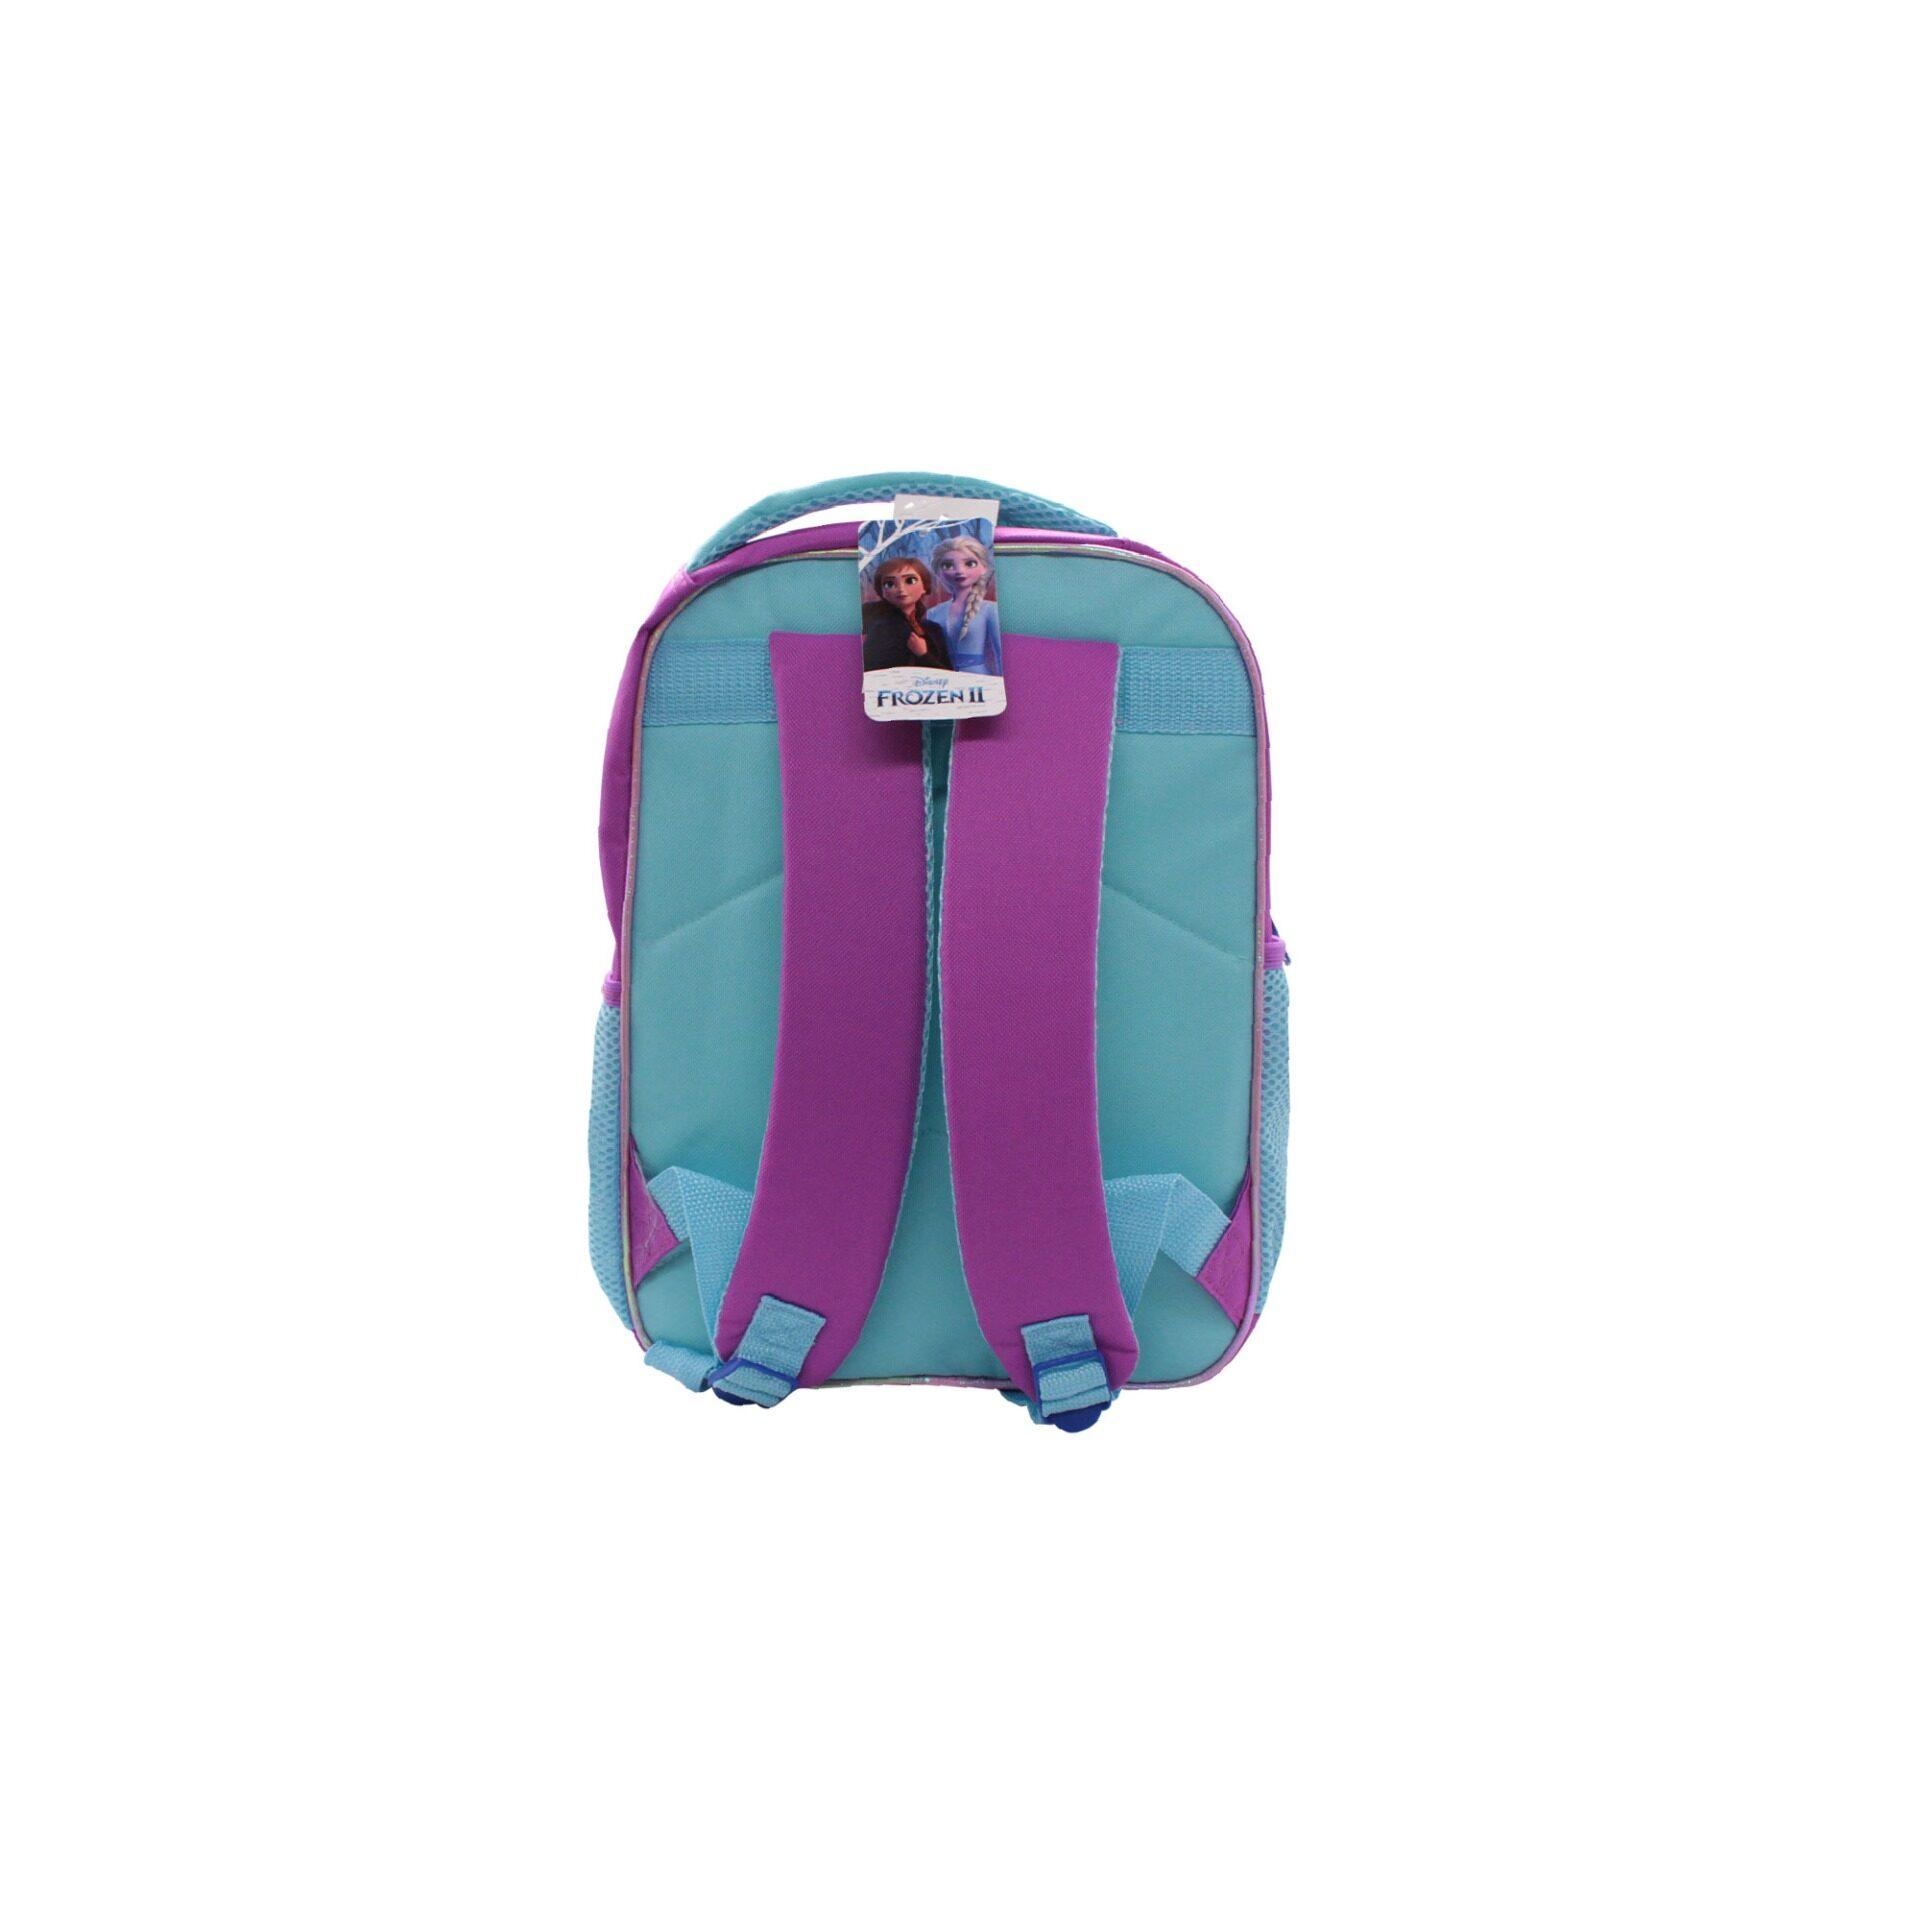 Disney Frozen 2 Princess Elsa & Anna Trust Your Journey With Front Zipper Pouch Kids Girls Pre School Bag (Purple & Turqoise)